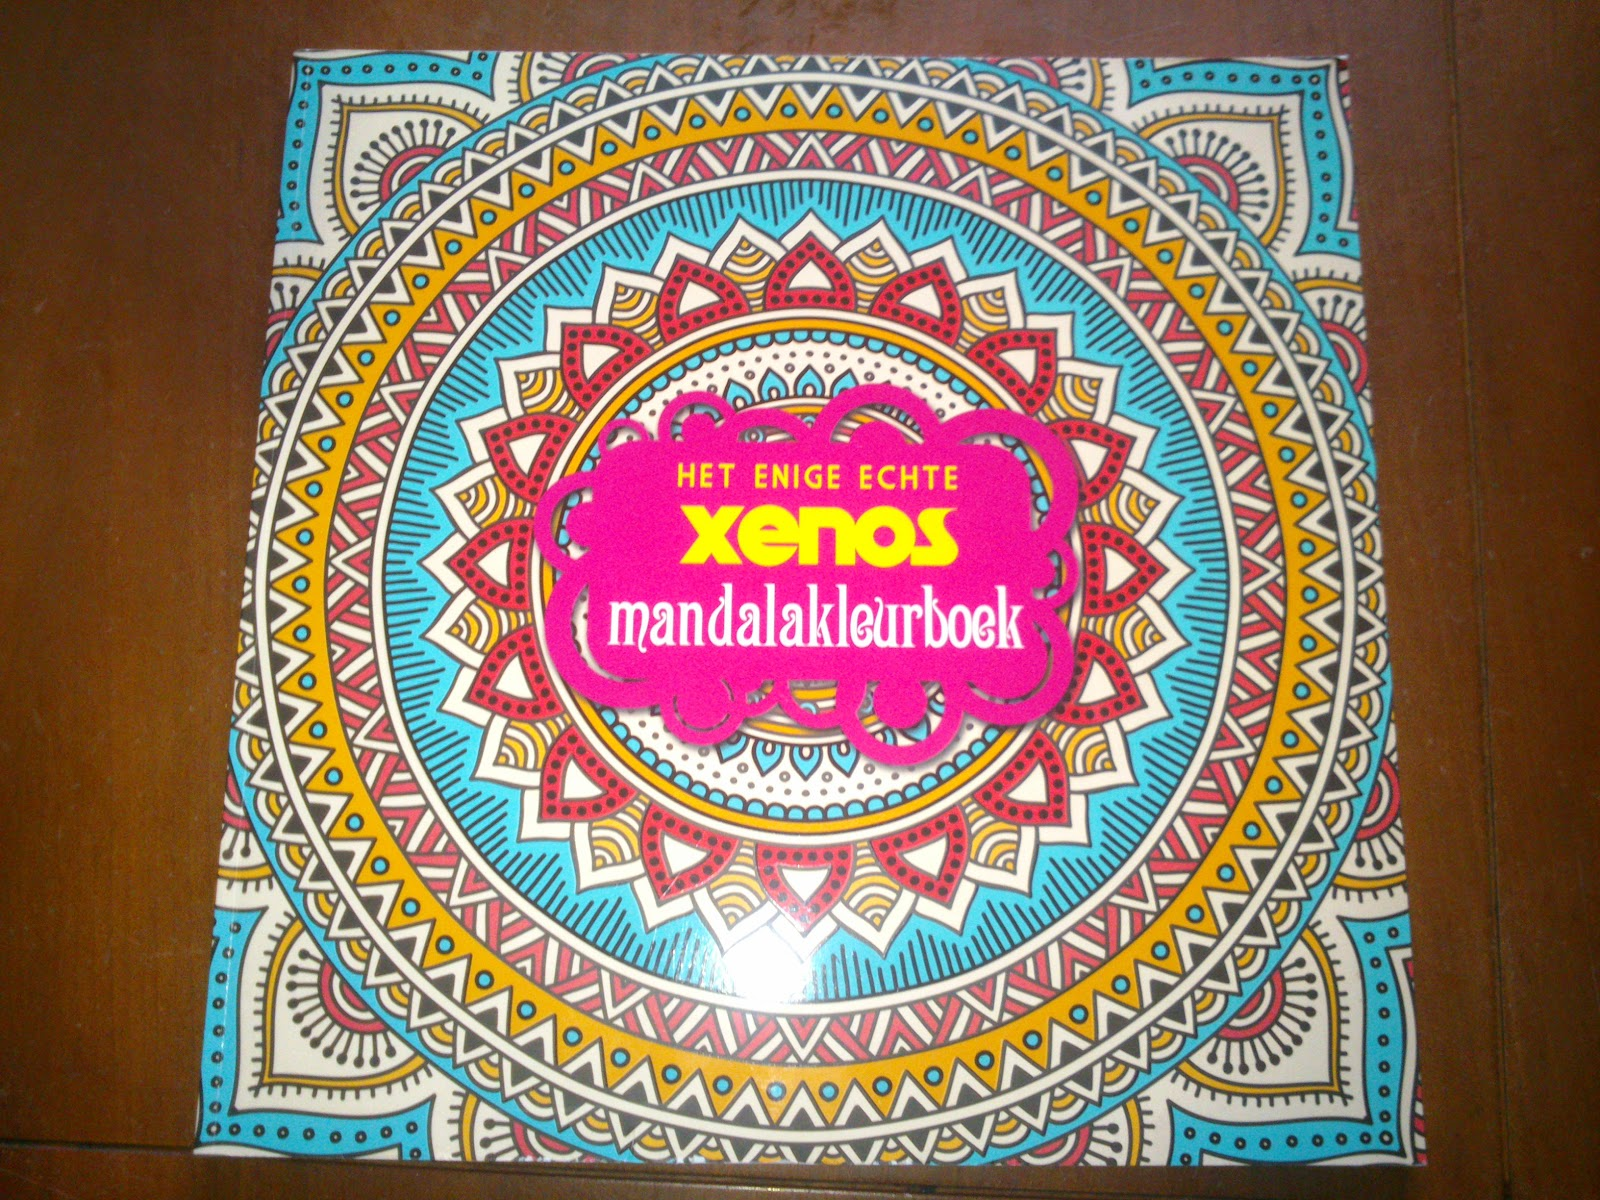 Kleurplaten Volwassenen Ingekleurd.Mooi Mandala Kleurplaten Voor Volwassenen Kopen Klupaats Website